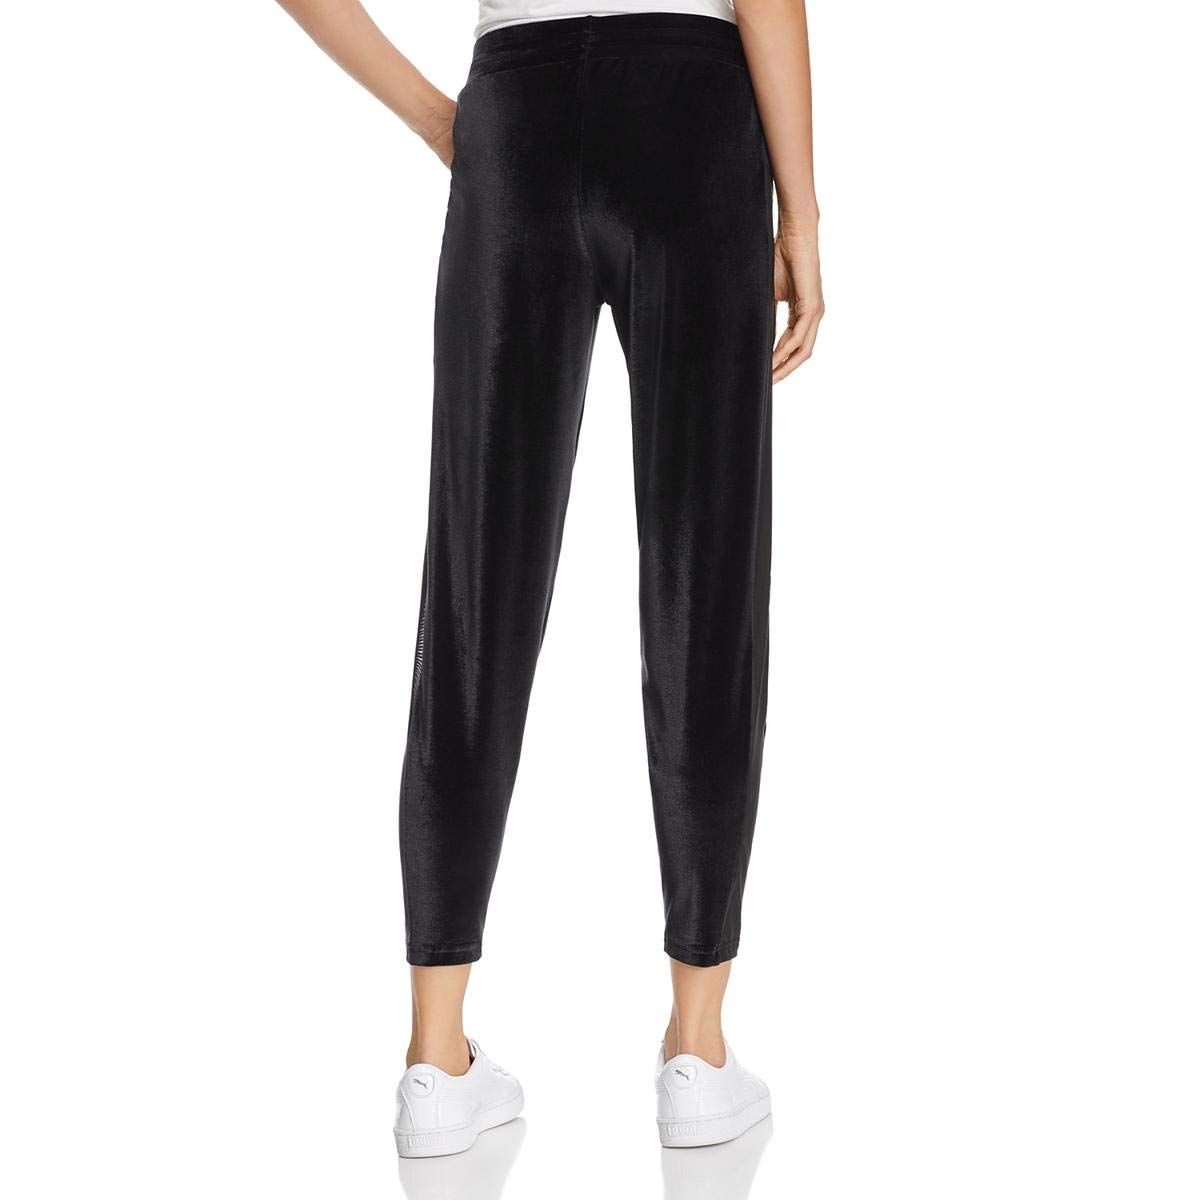 4a4f74cb6459b PUMA Womens Yogini Velvet Pants at Amazon Women's Clothing store: